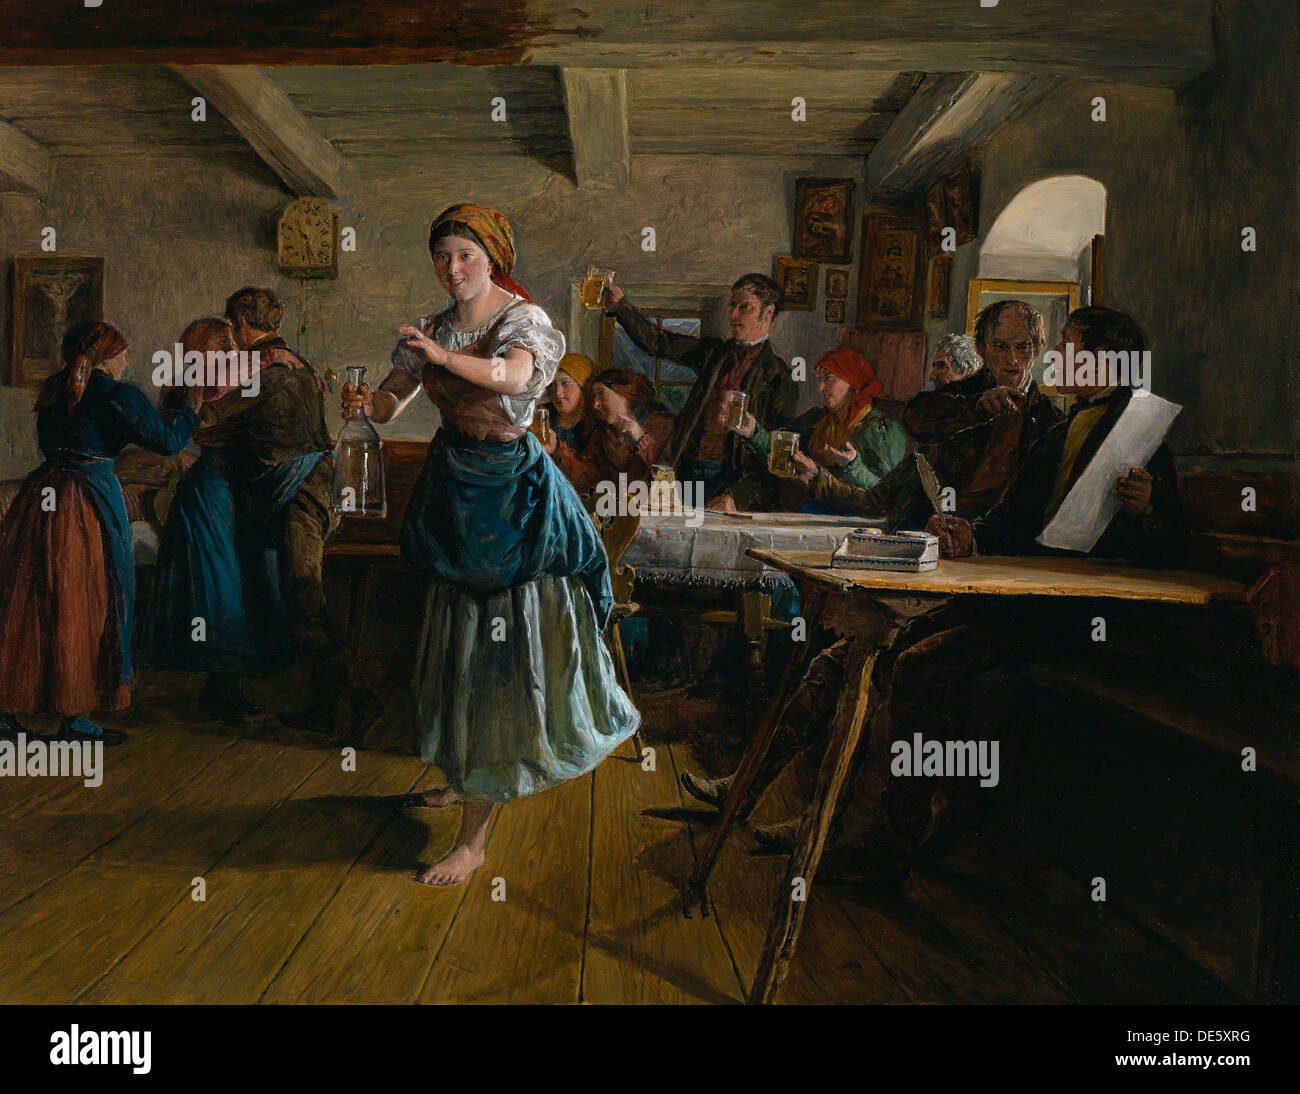 The Opening Dance, 1863. Artist: Waldmüller, Ferdinand Georg (1793-1865) - Stock Image